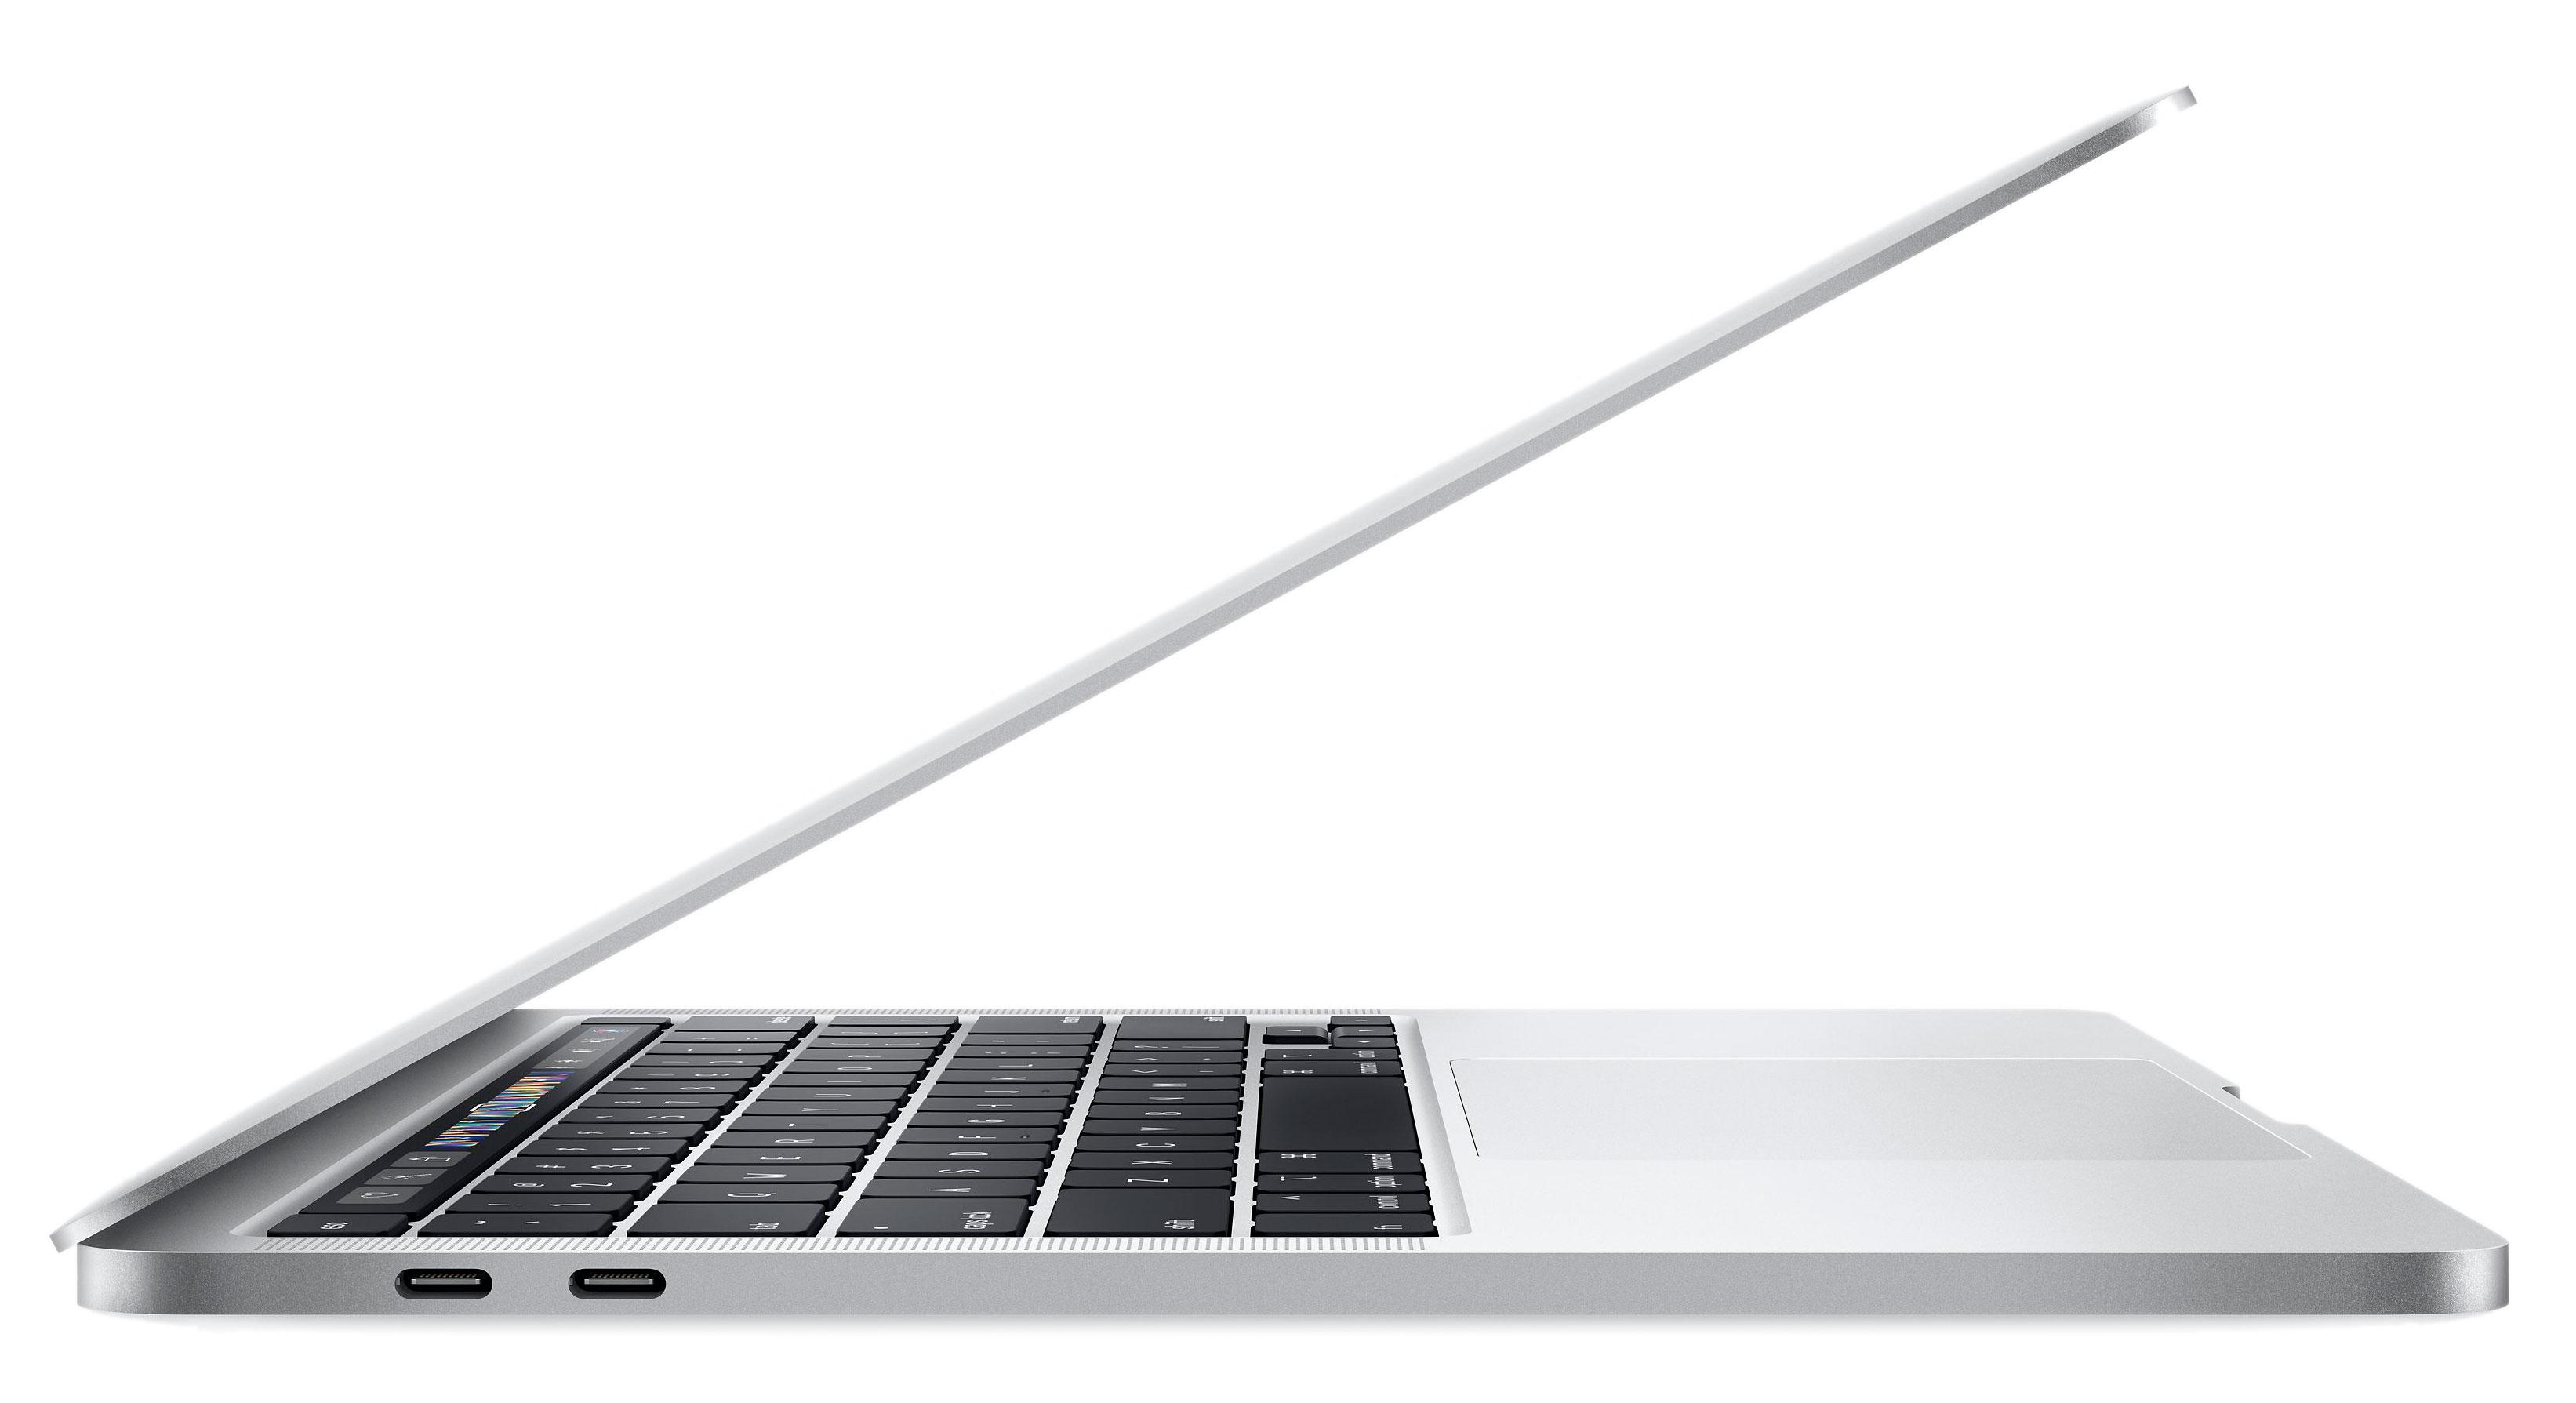 13‑inch MacBook Pro - Zilver - Intel 2,0‑GHz quad‑coreprocessor - 16 GB RAM - 512 GB SSD - Vier (USB‑C) Thunderbolt 3‑...